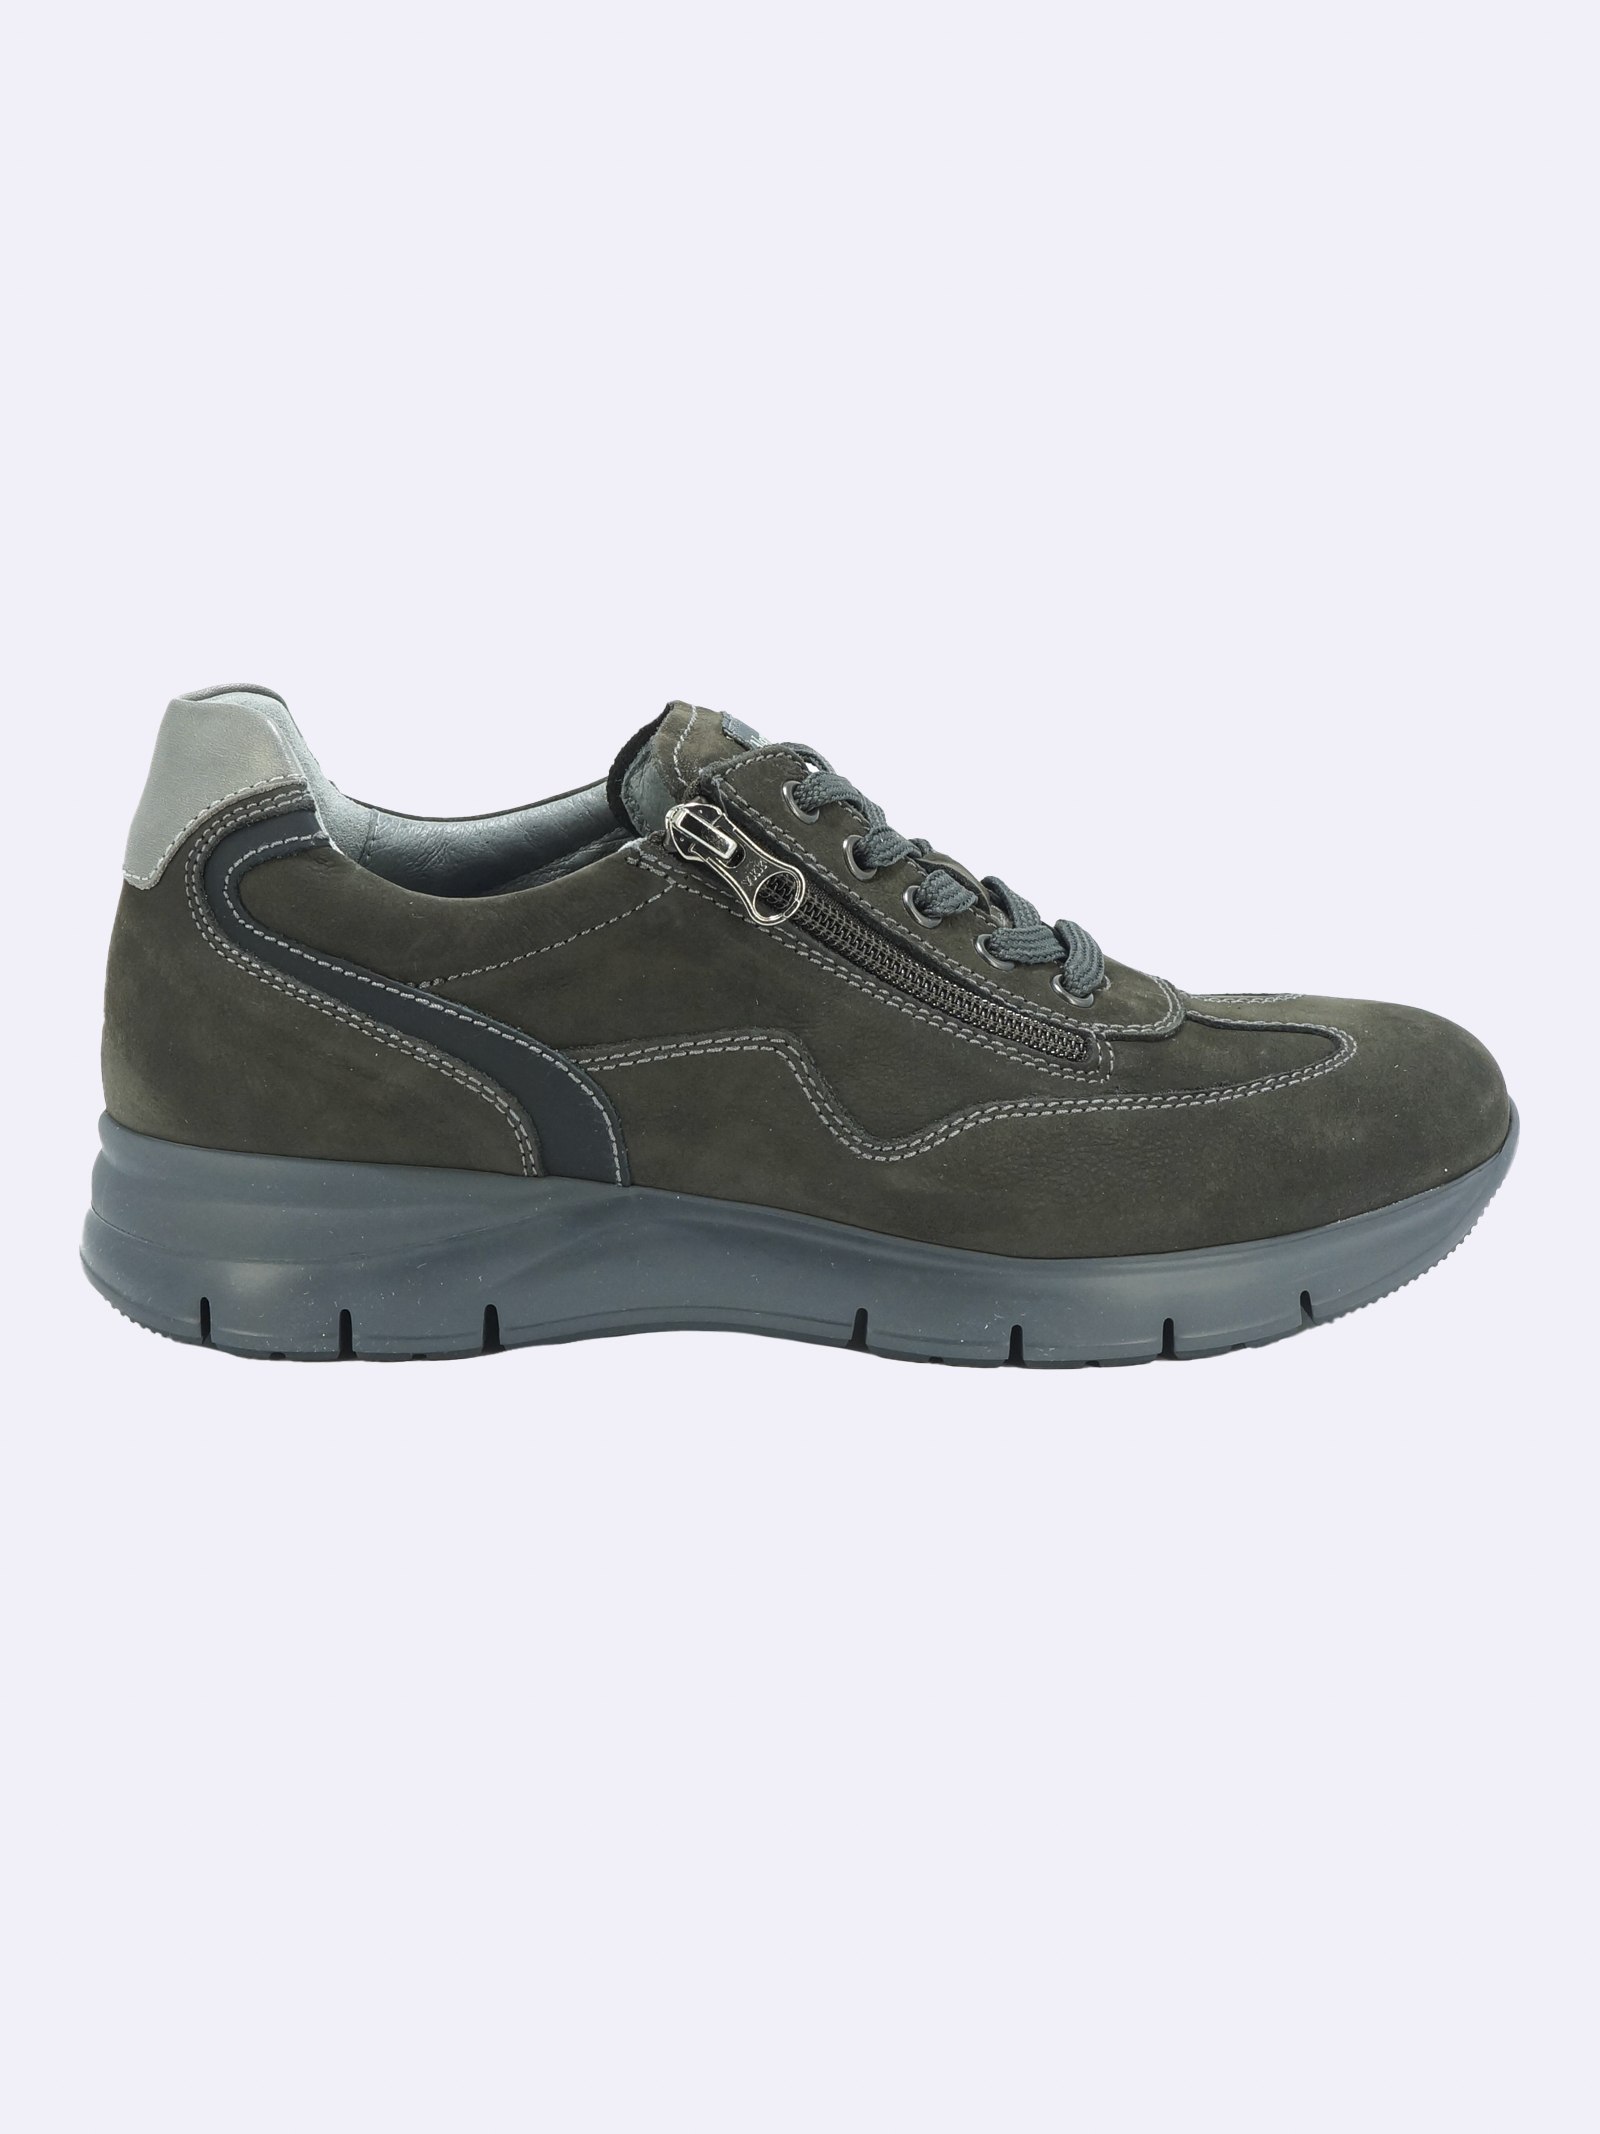 Sneakers Uomo in Pelle Nero Giardini Nero Giardini | Sneakers | I102154U101